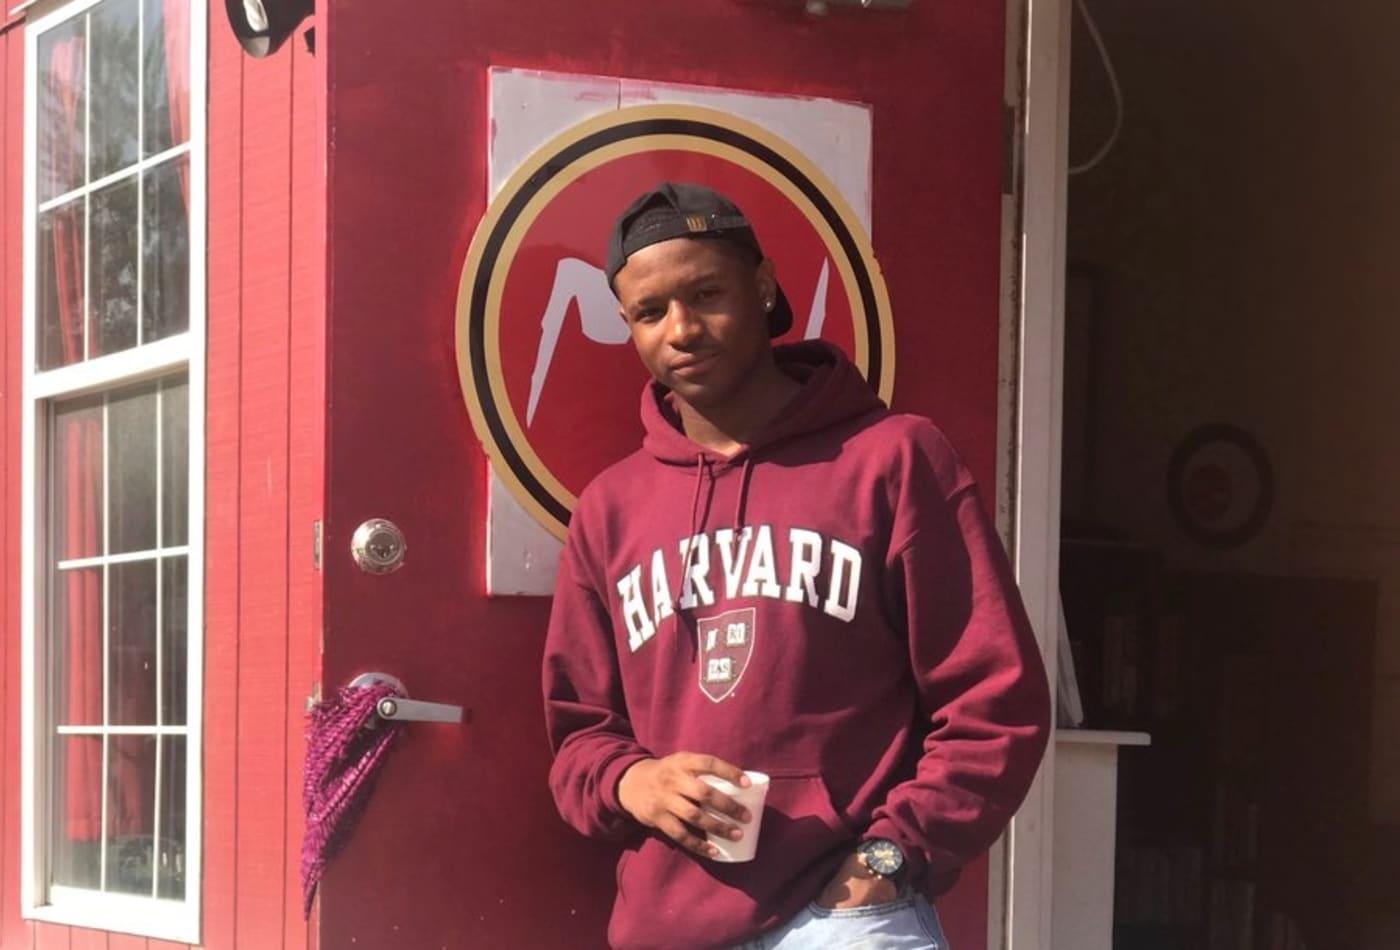 cd86fe32980 Teen who grew up in homeless shelters earns full ride to Harvard University